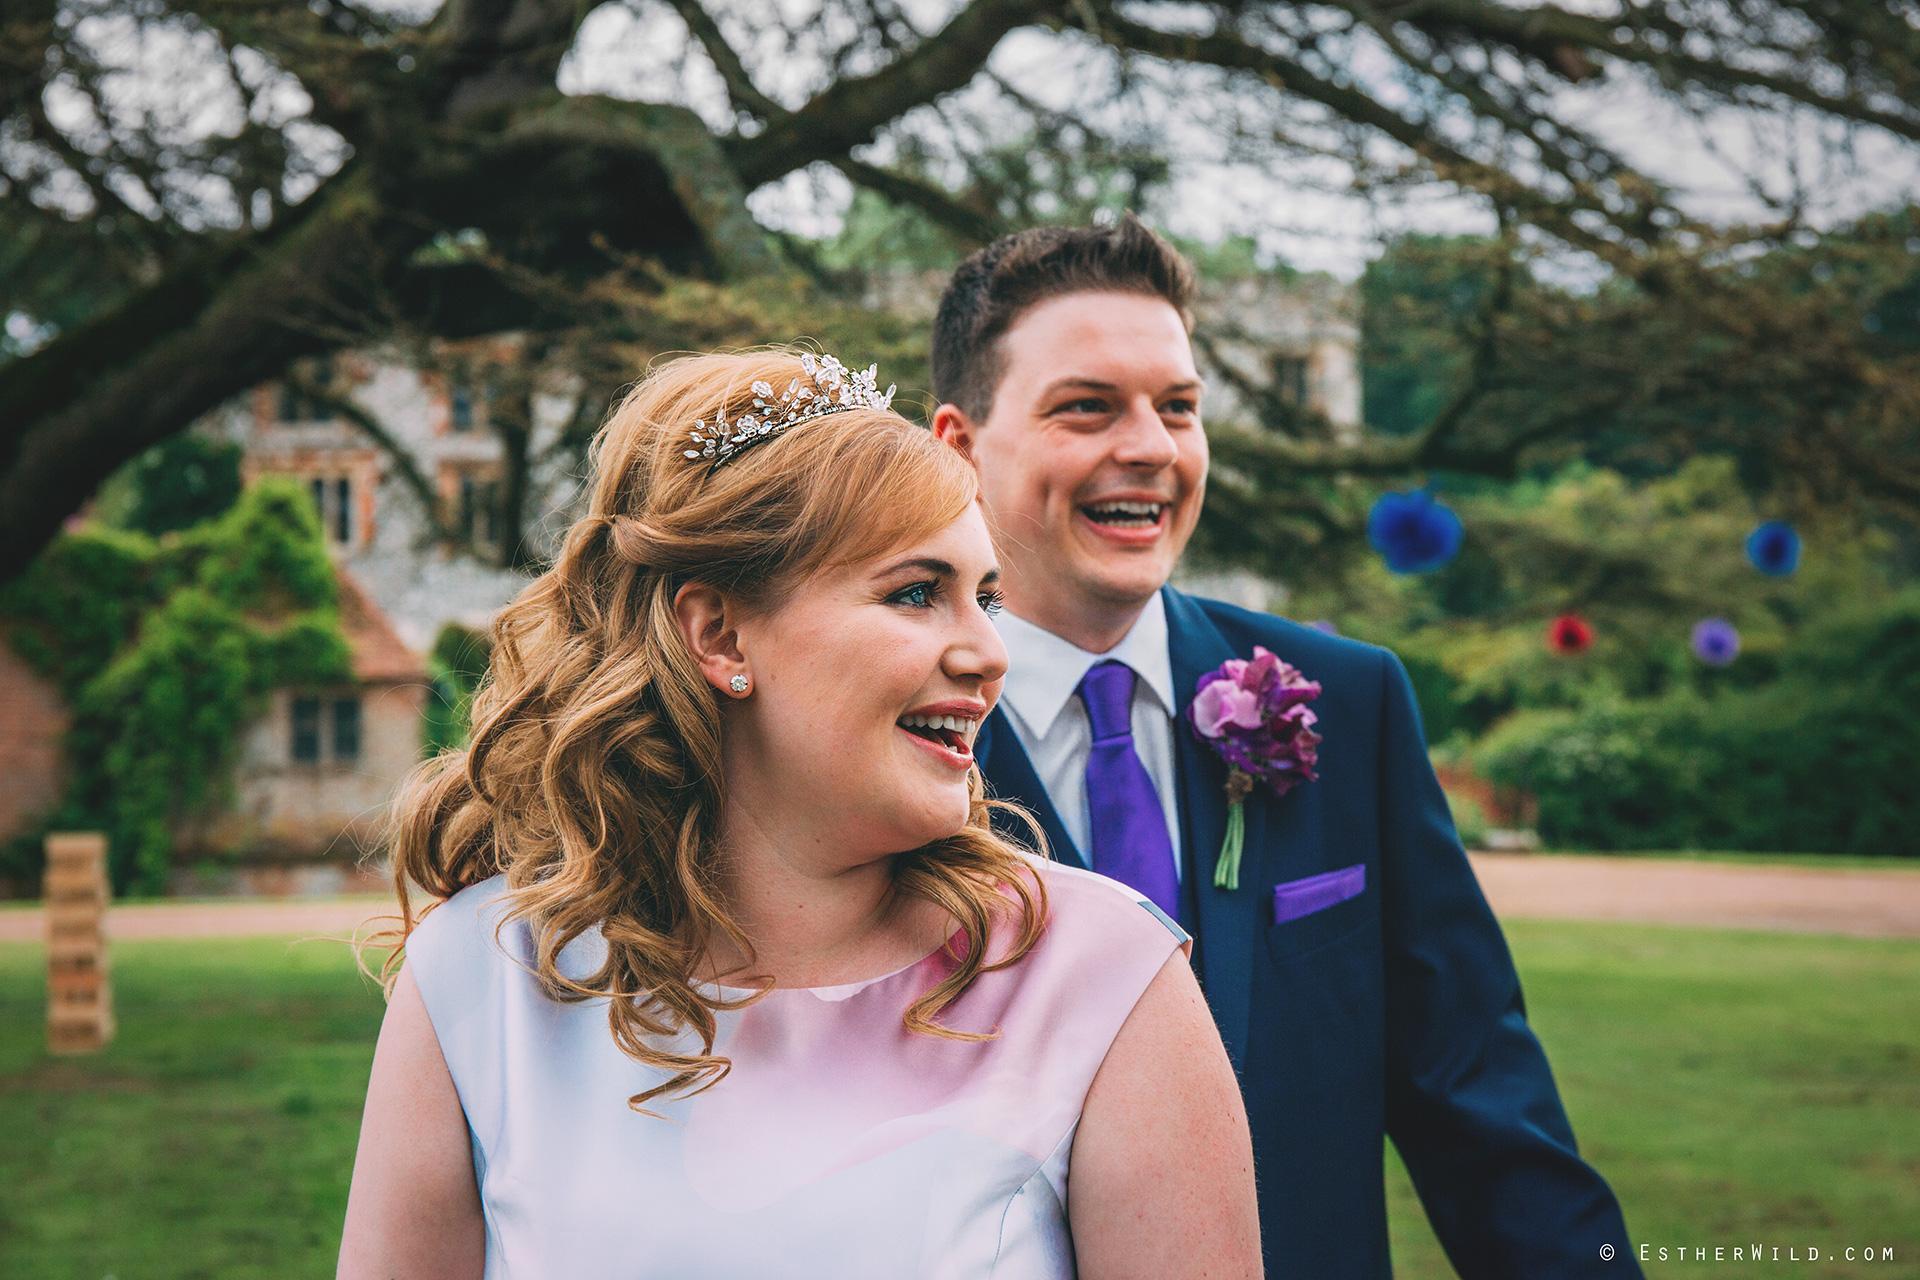 Norfolk_Wedding_Photographer_Mannington_Hall_Country_Esther_Wild_0060.jpg